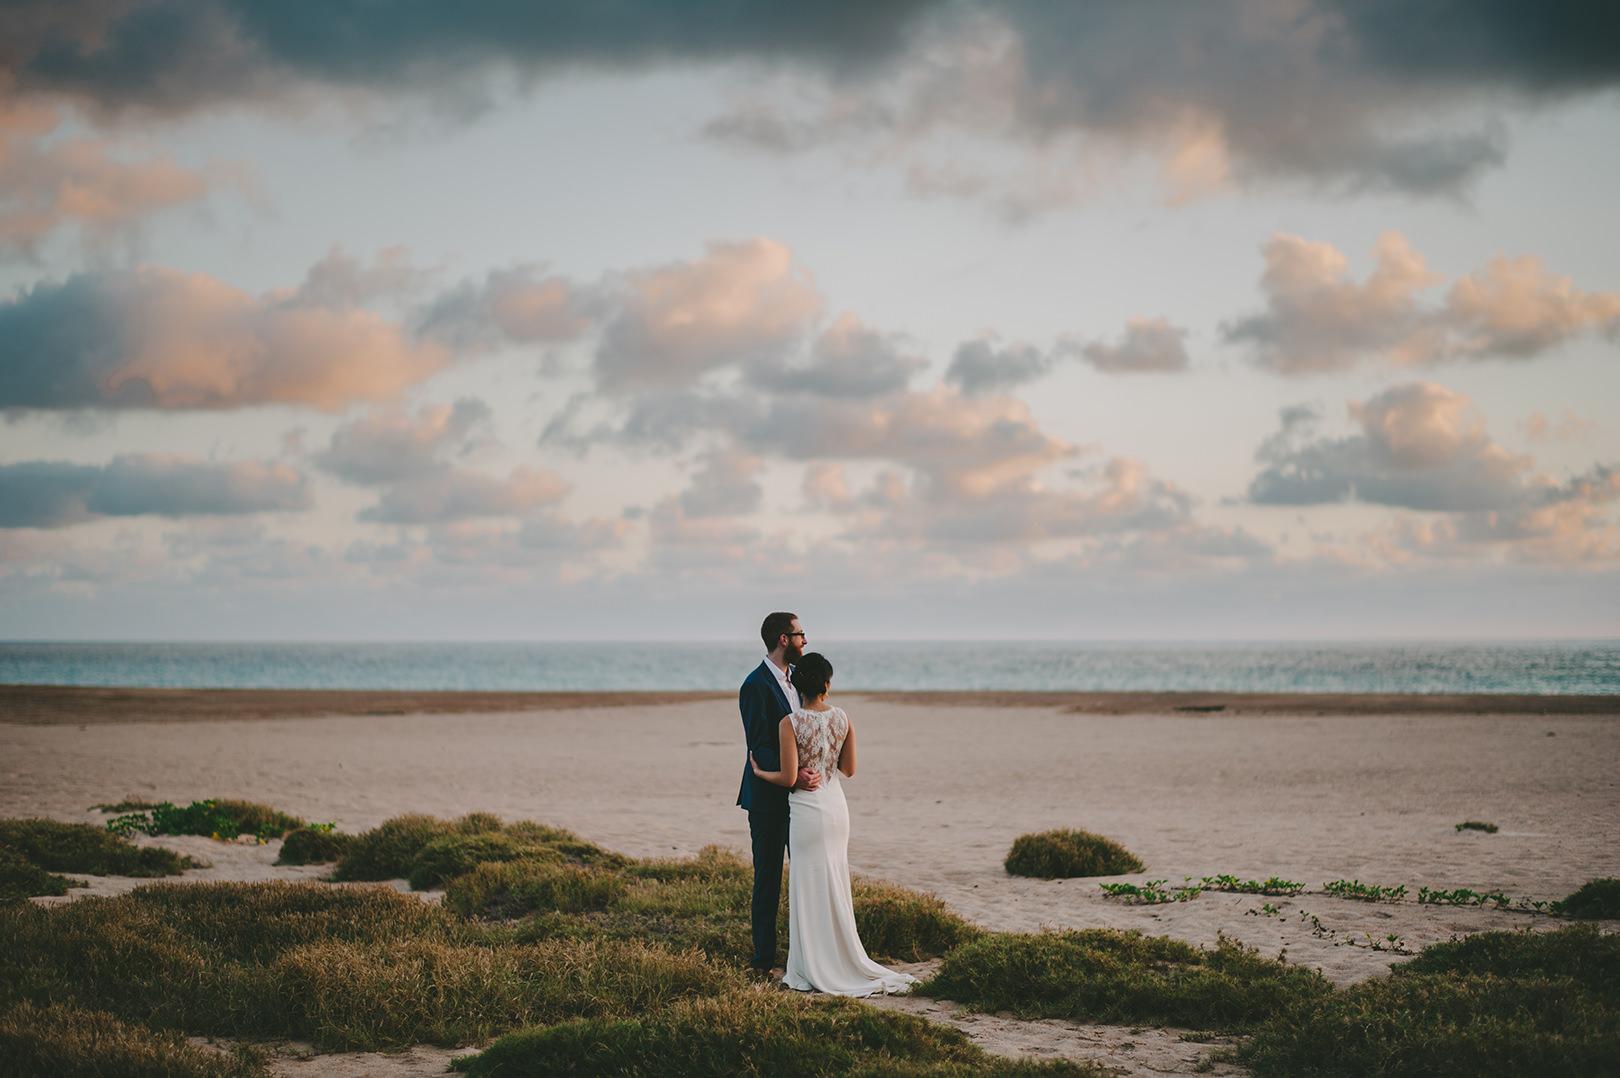 Spain Wedding Photographer - © Dallas Kolotylo Photography - 084